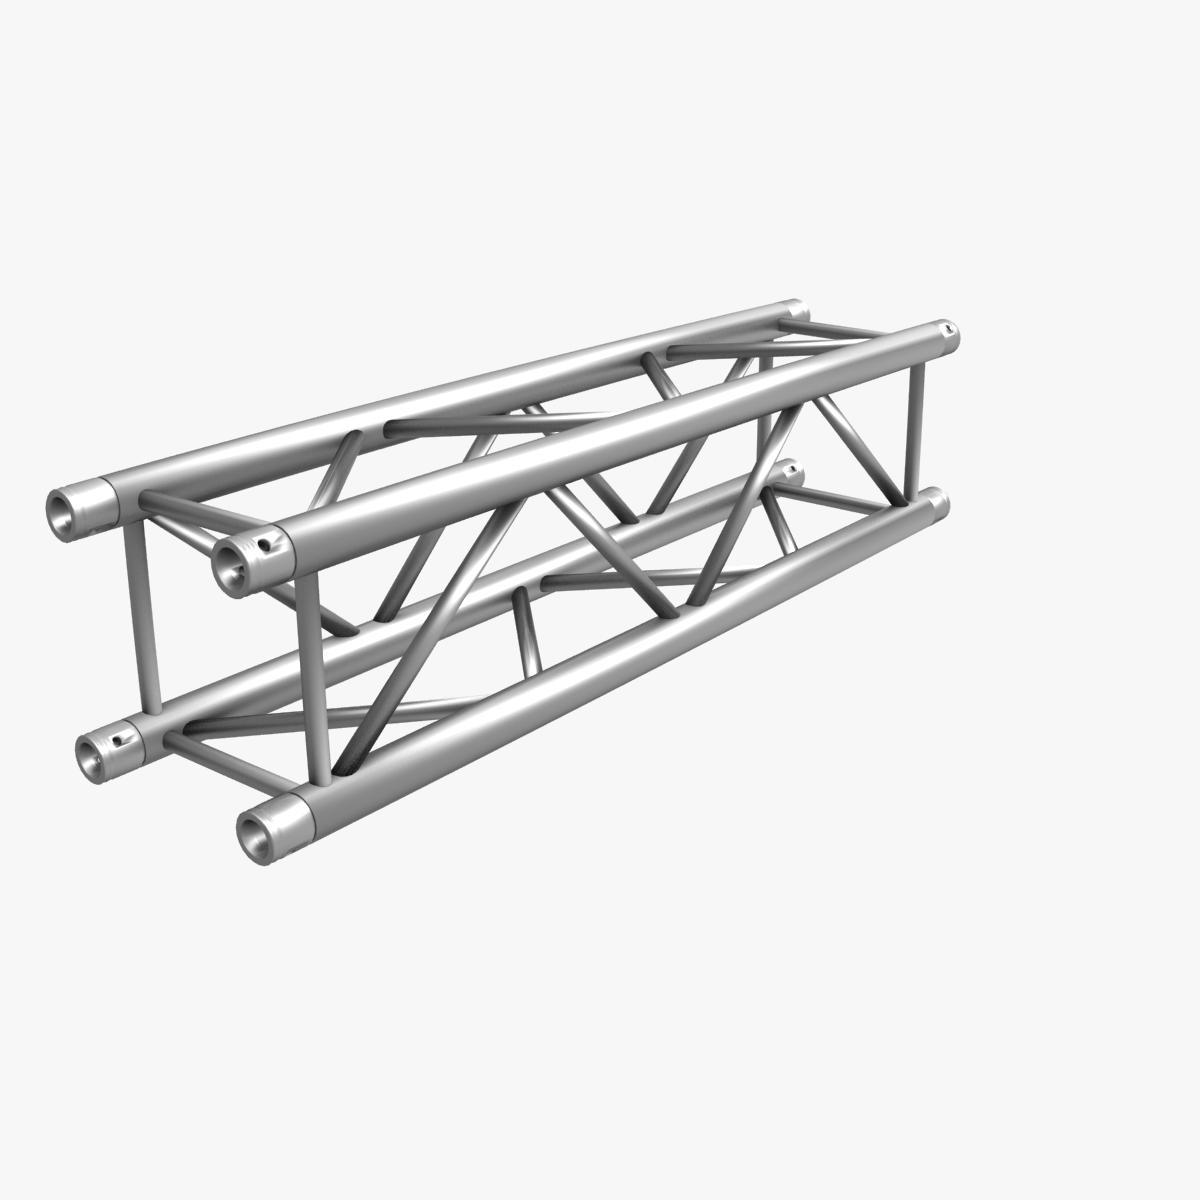 30-21_1200x1200_01.jpg Download free STL file Square Truss Straight Segment 21 • 3D printable object, akerStudio